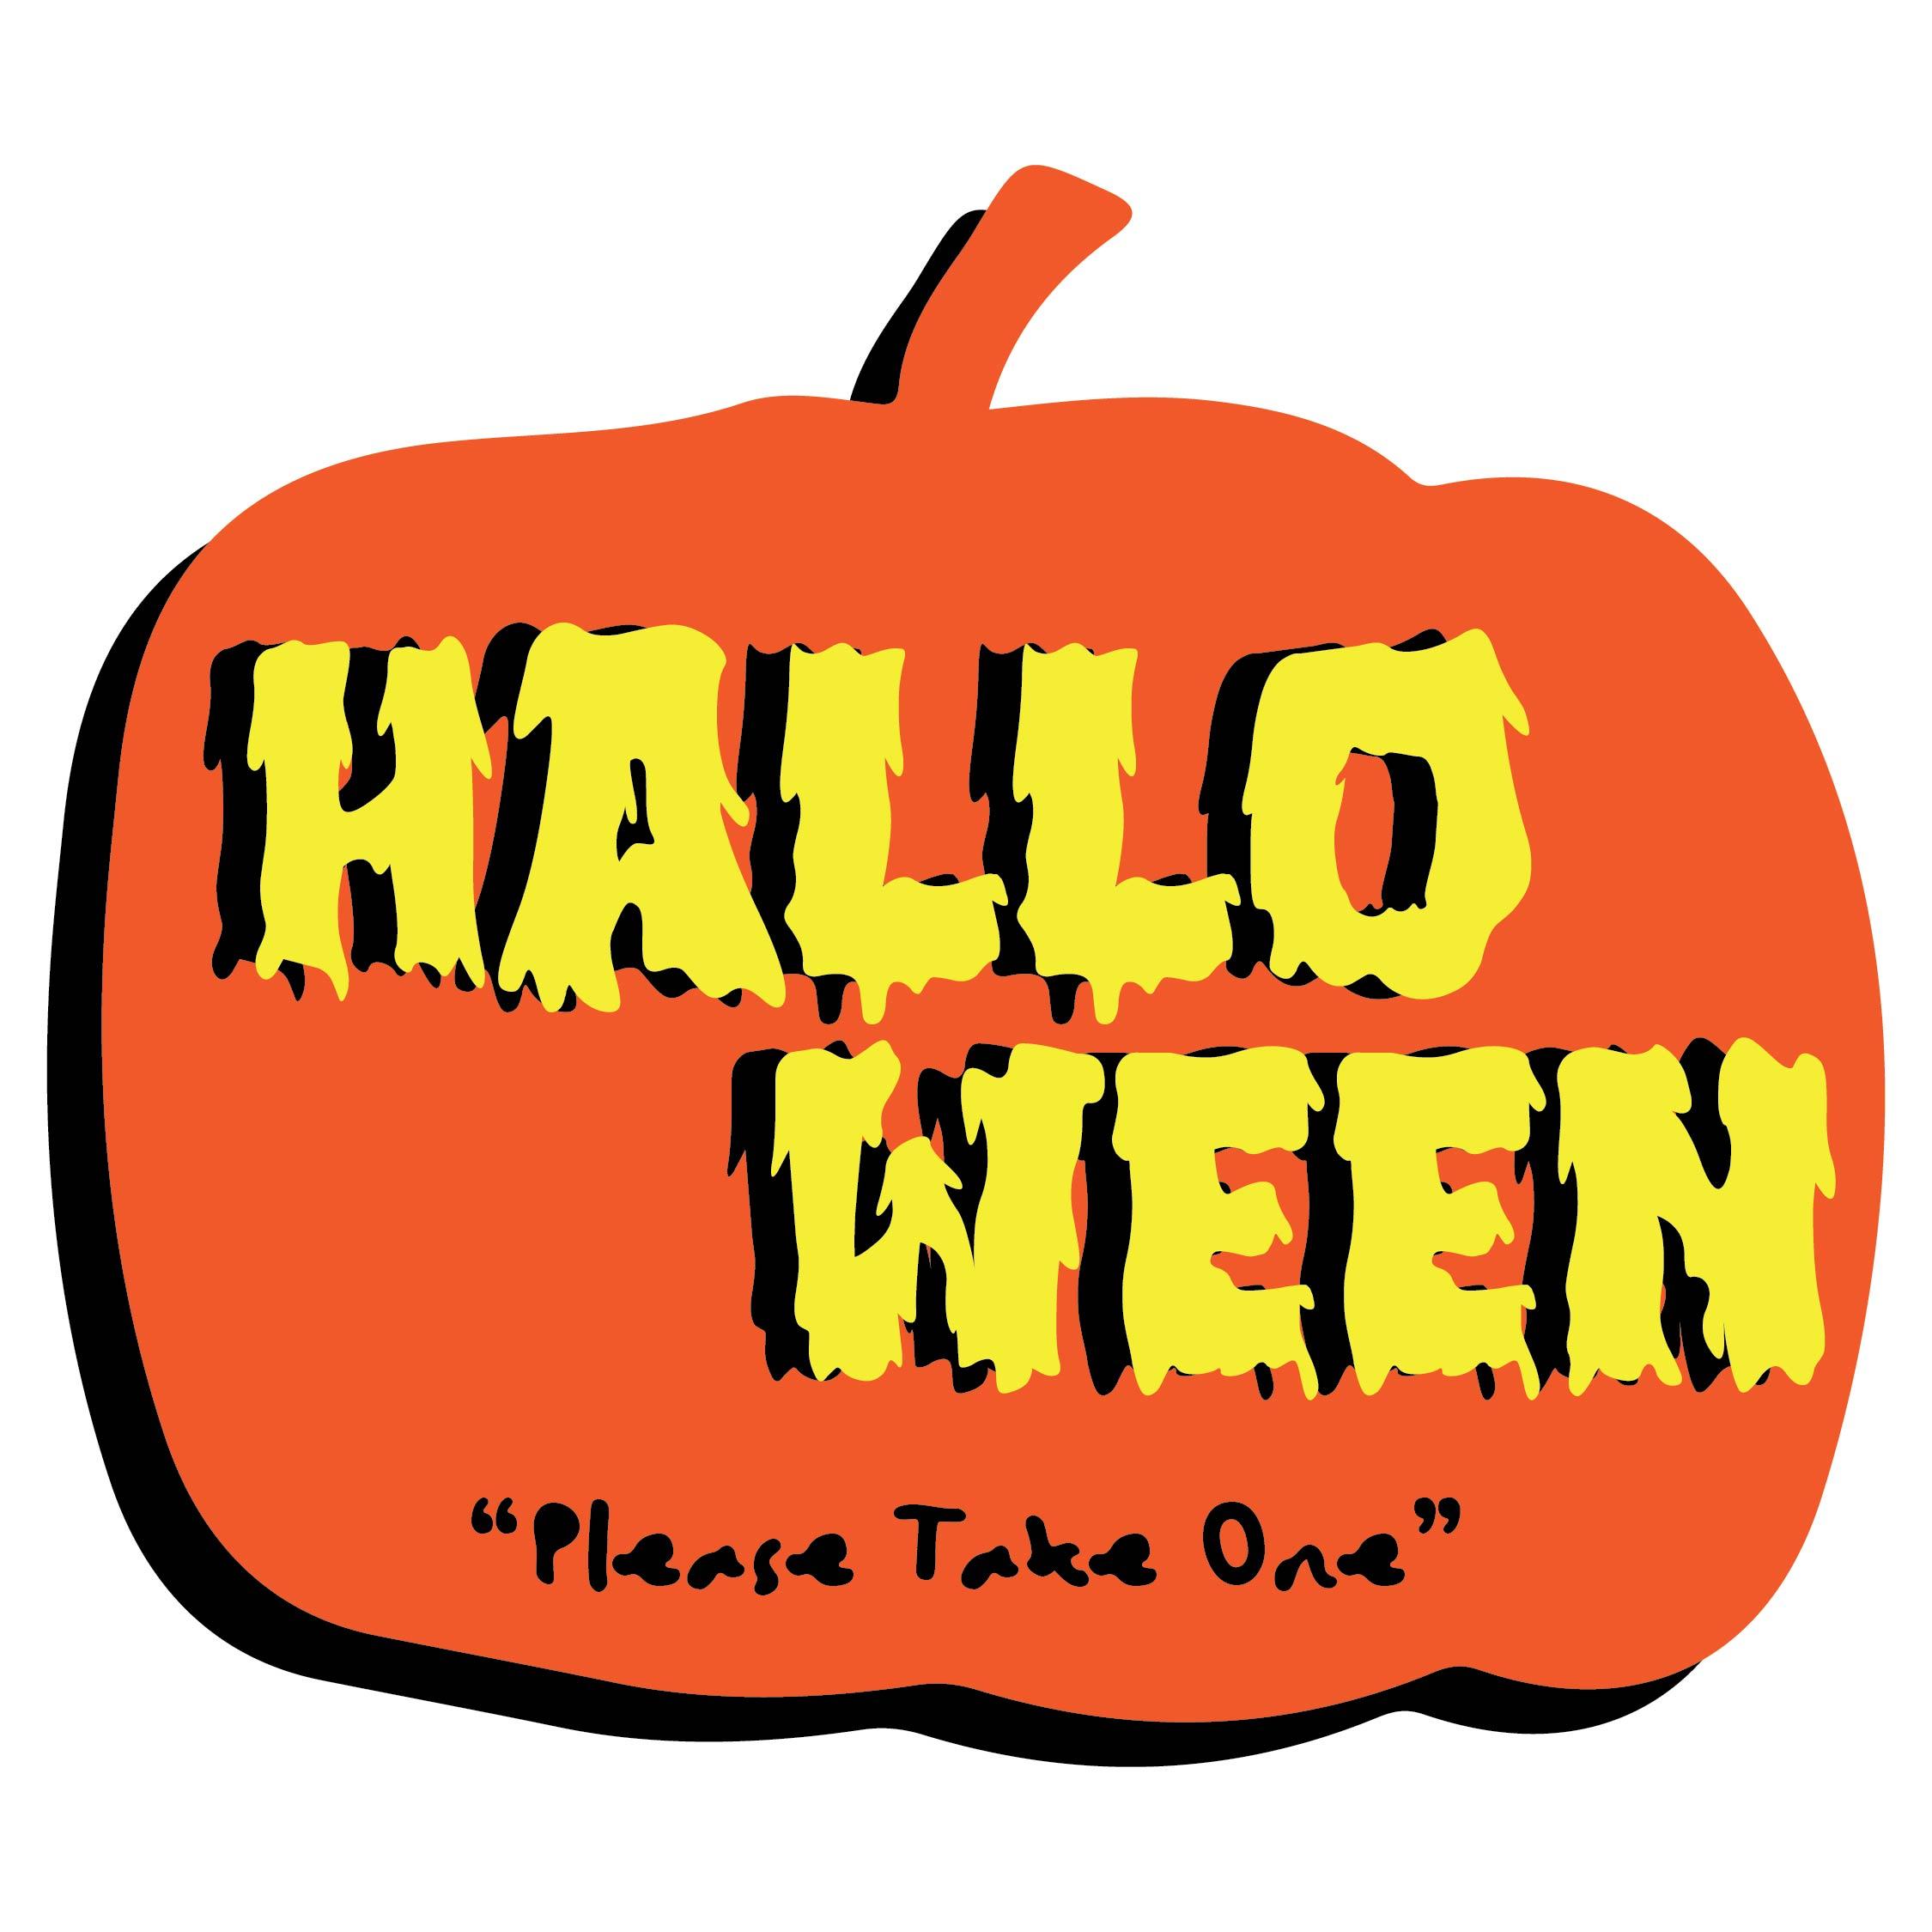 Printable Halloween Please Take One Sign